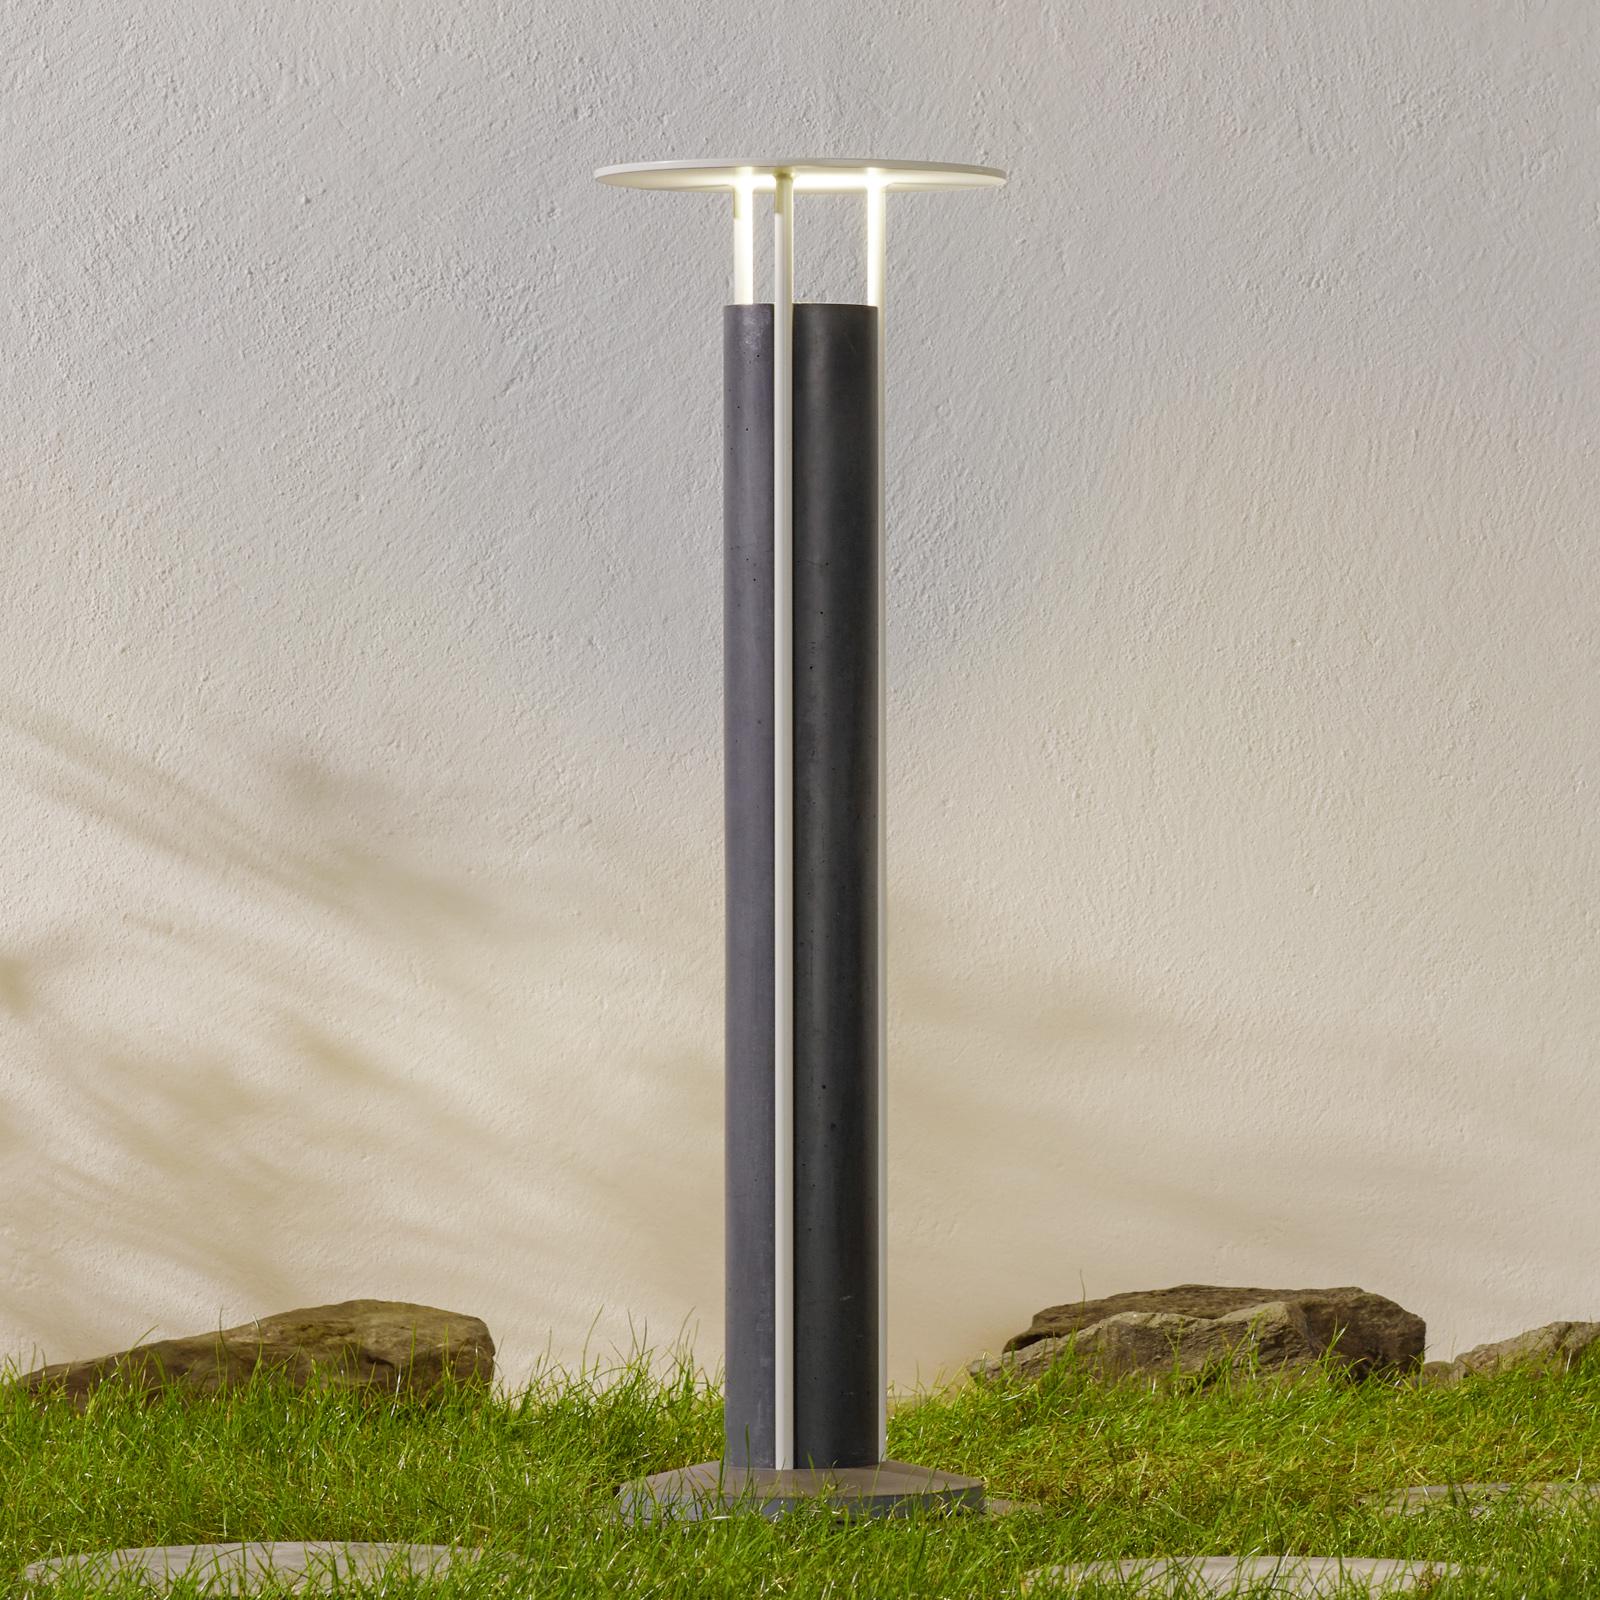 Gånglampa Ercole - DesignStudio Formidable svart